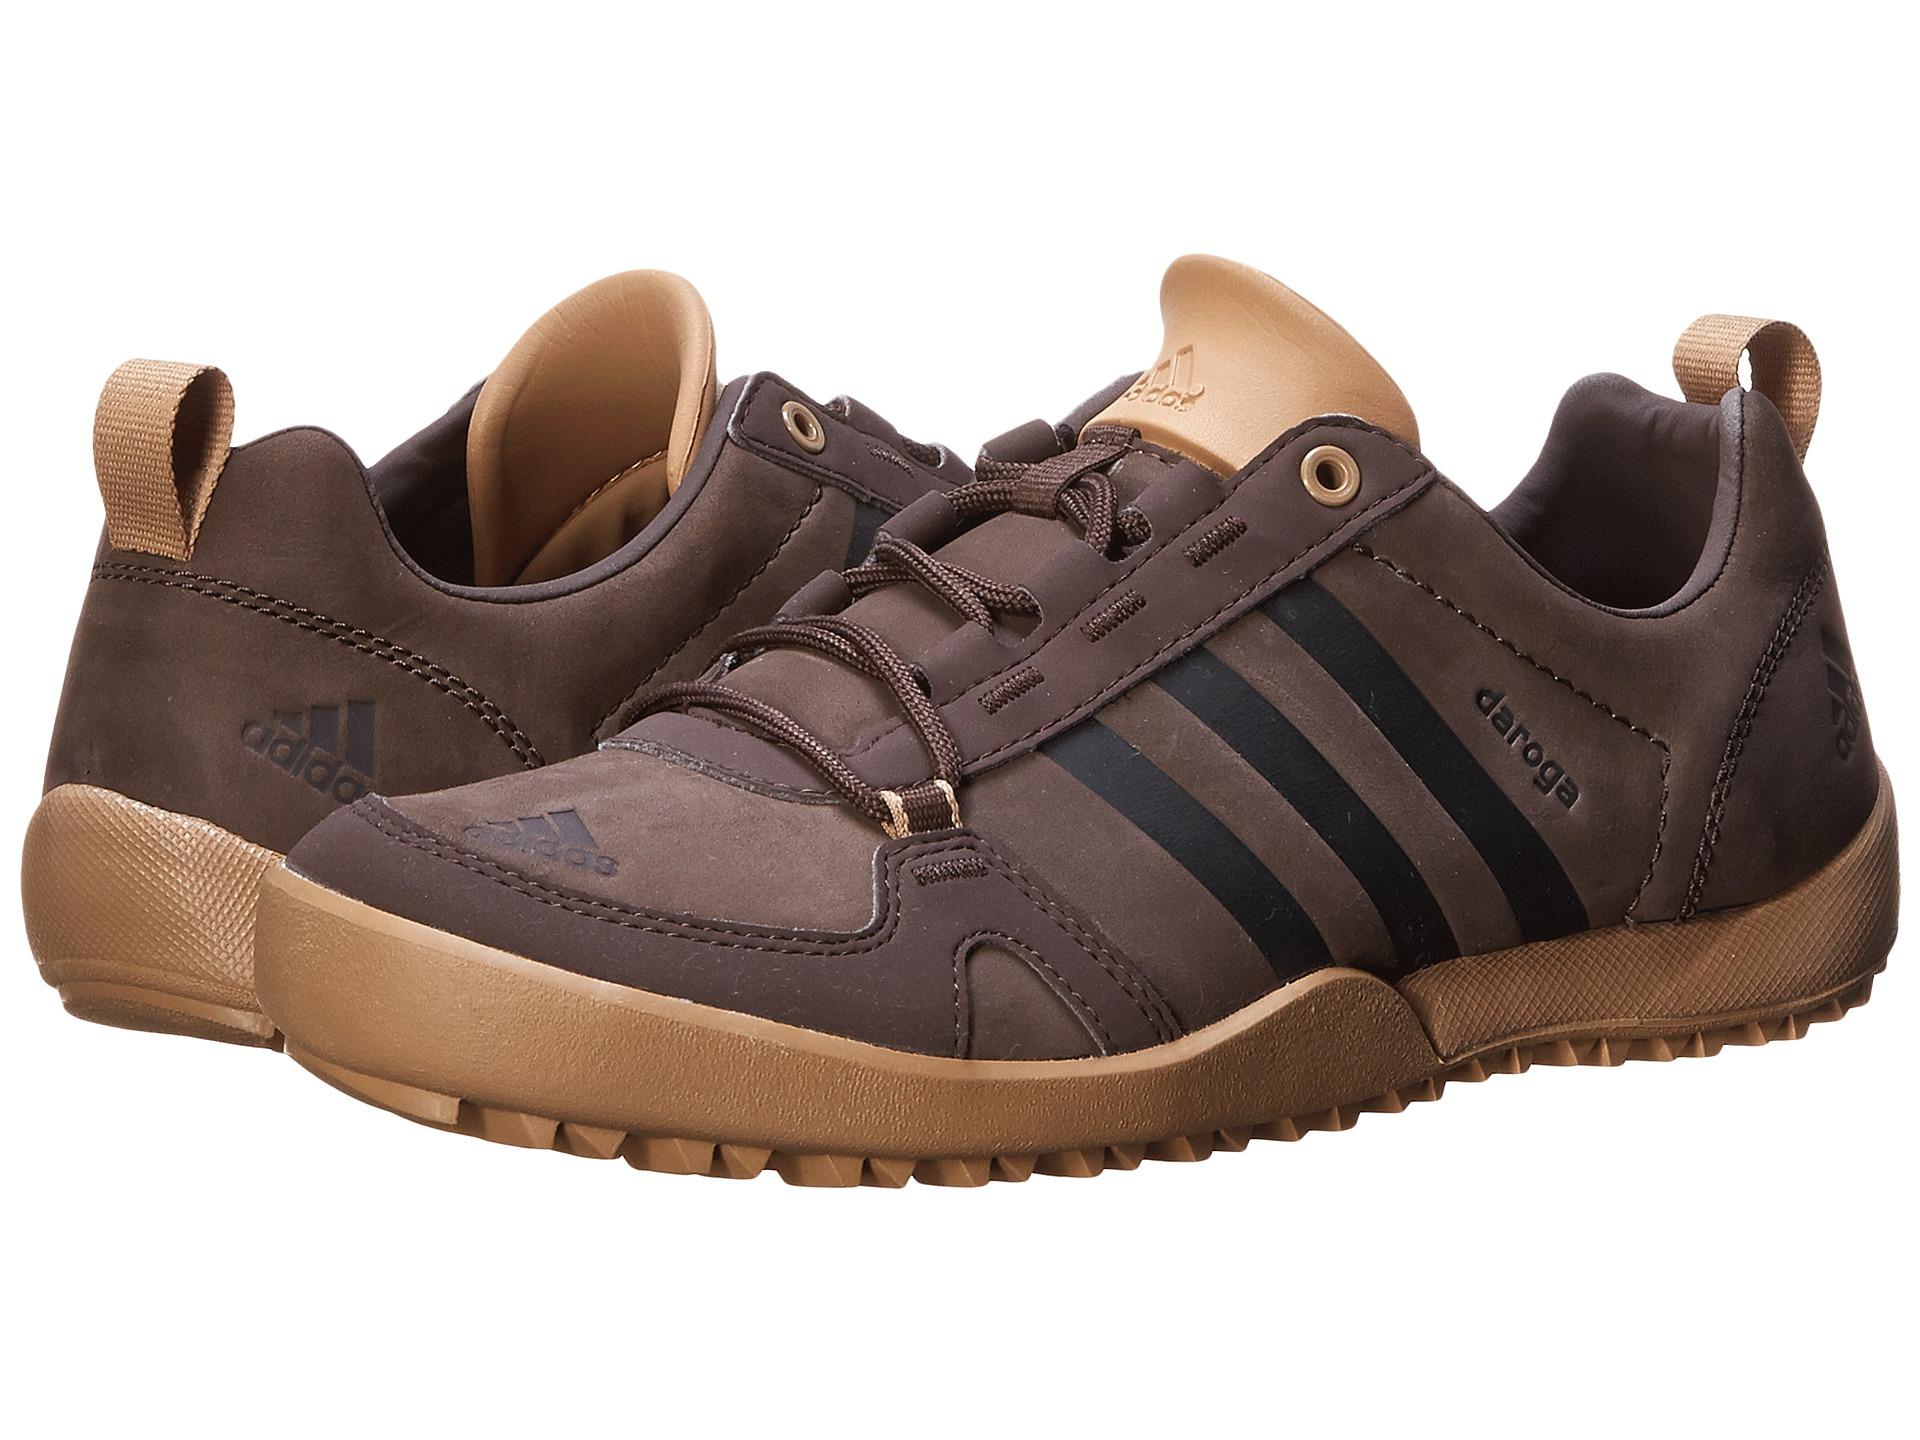 Adidas Daroga Two 11 - Adidas Outdoor Daroga Two 11 Lea~2 Meilleur Prix